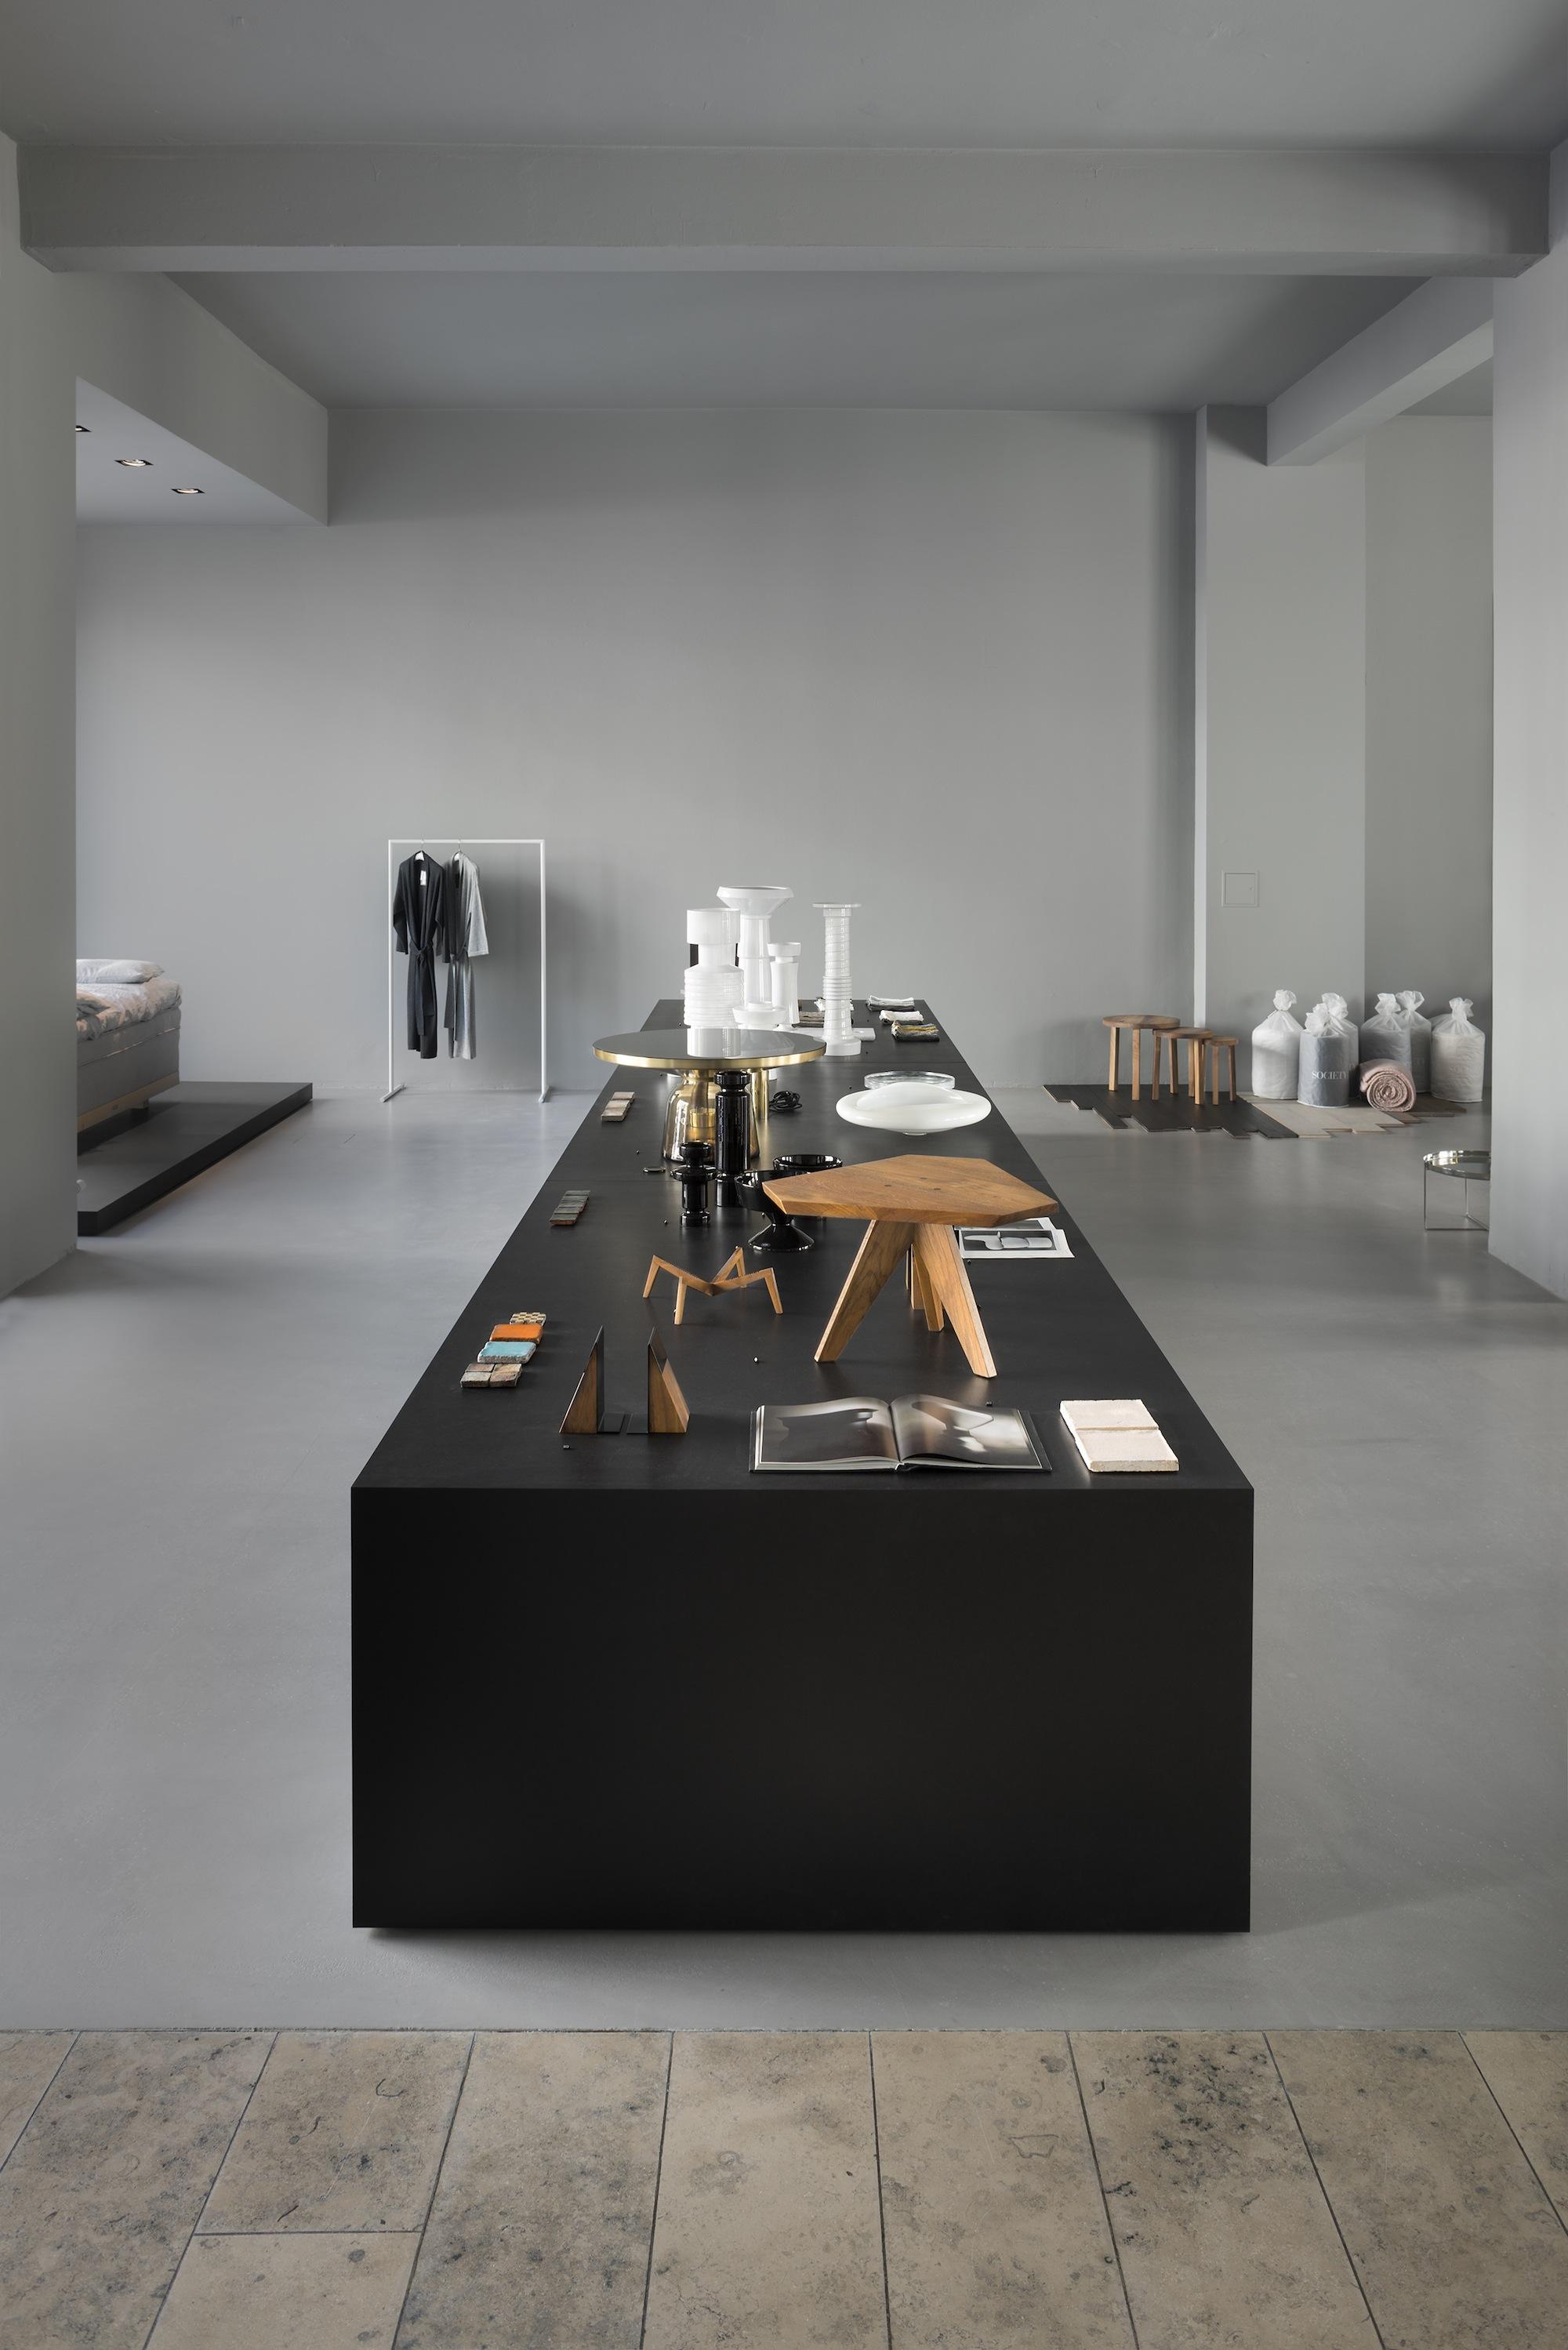 journelles am ma by andreas murkudis berlin 2 journelles. Black Bedroom Furniture Sets. Home Design Ideas